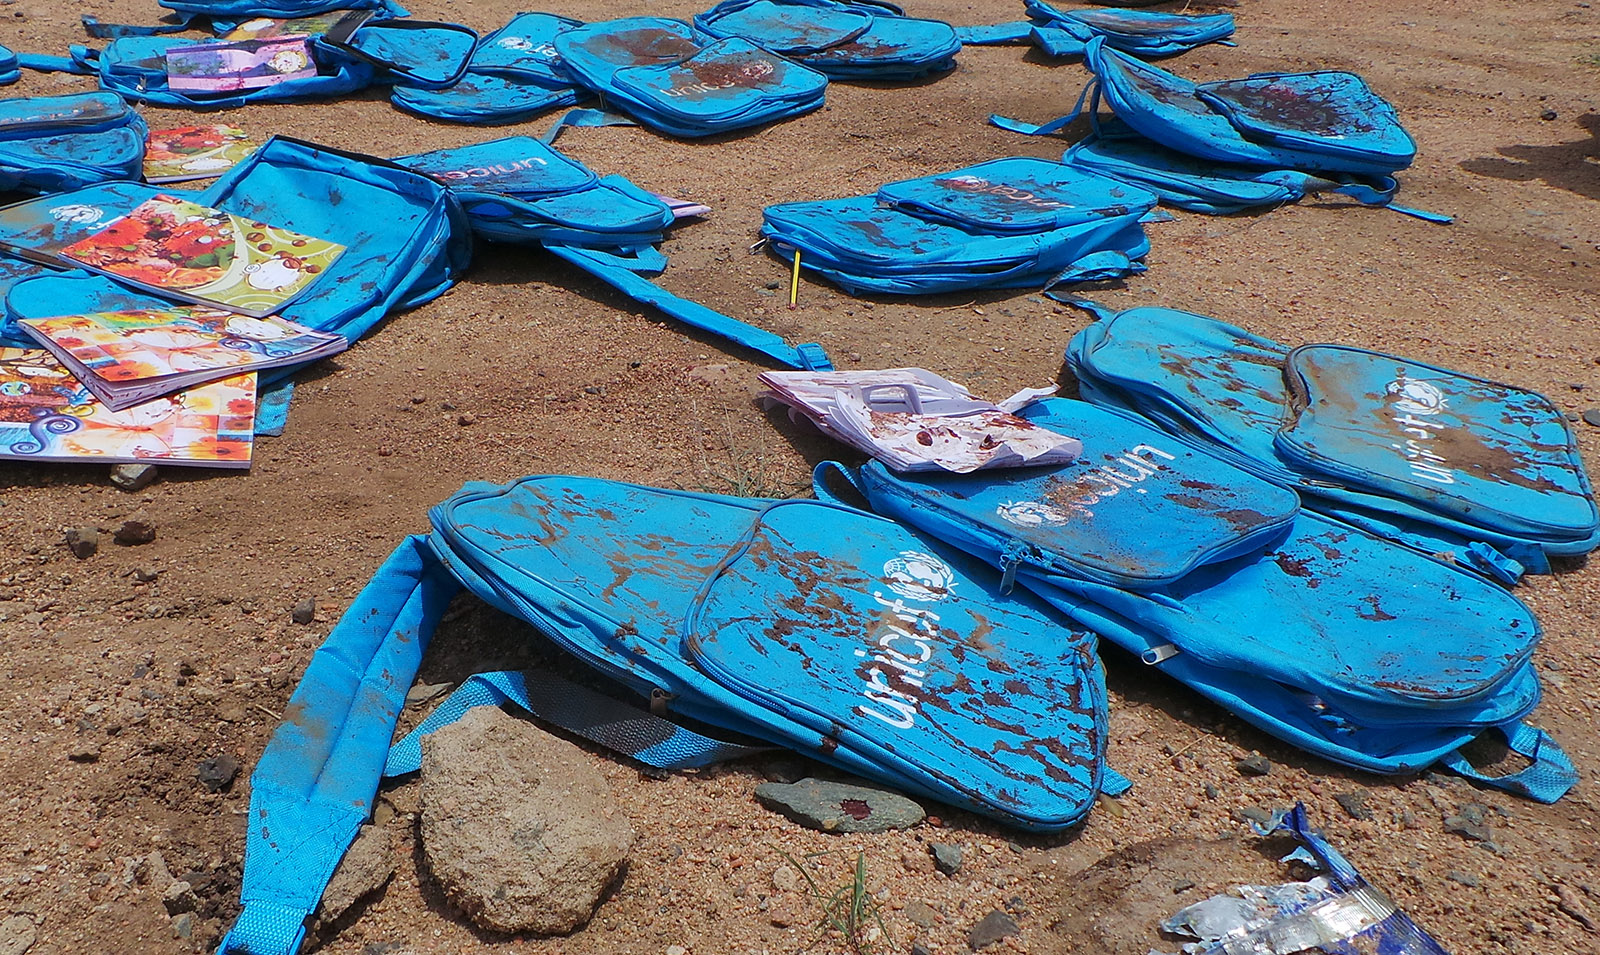 nybooks.com - Mark Weisbrot - How Congress Can End the War in Yemen